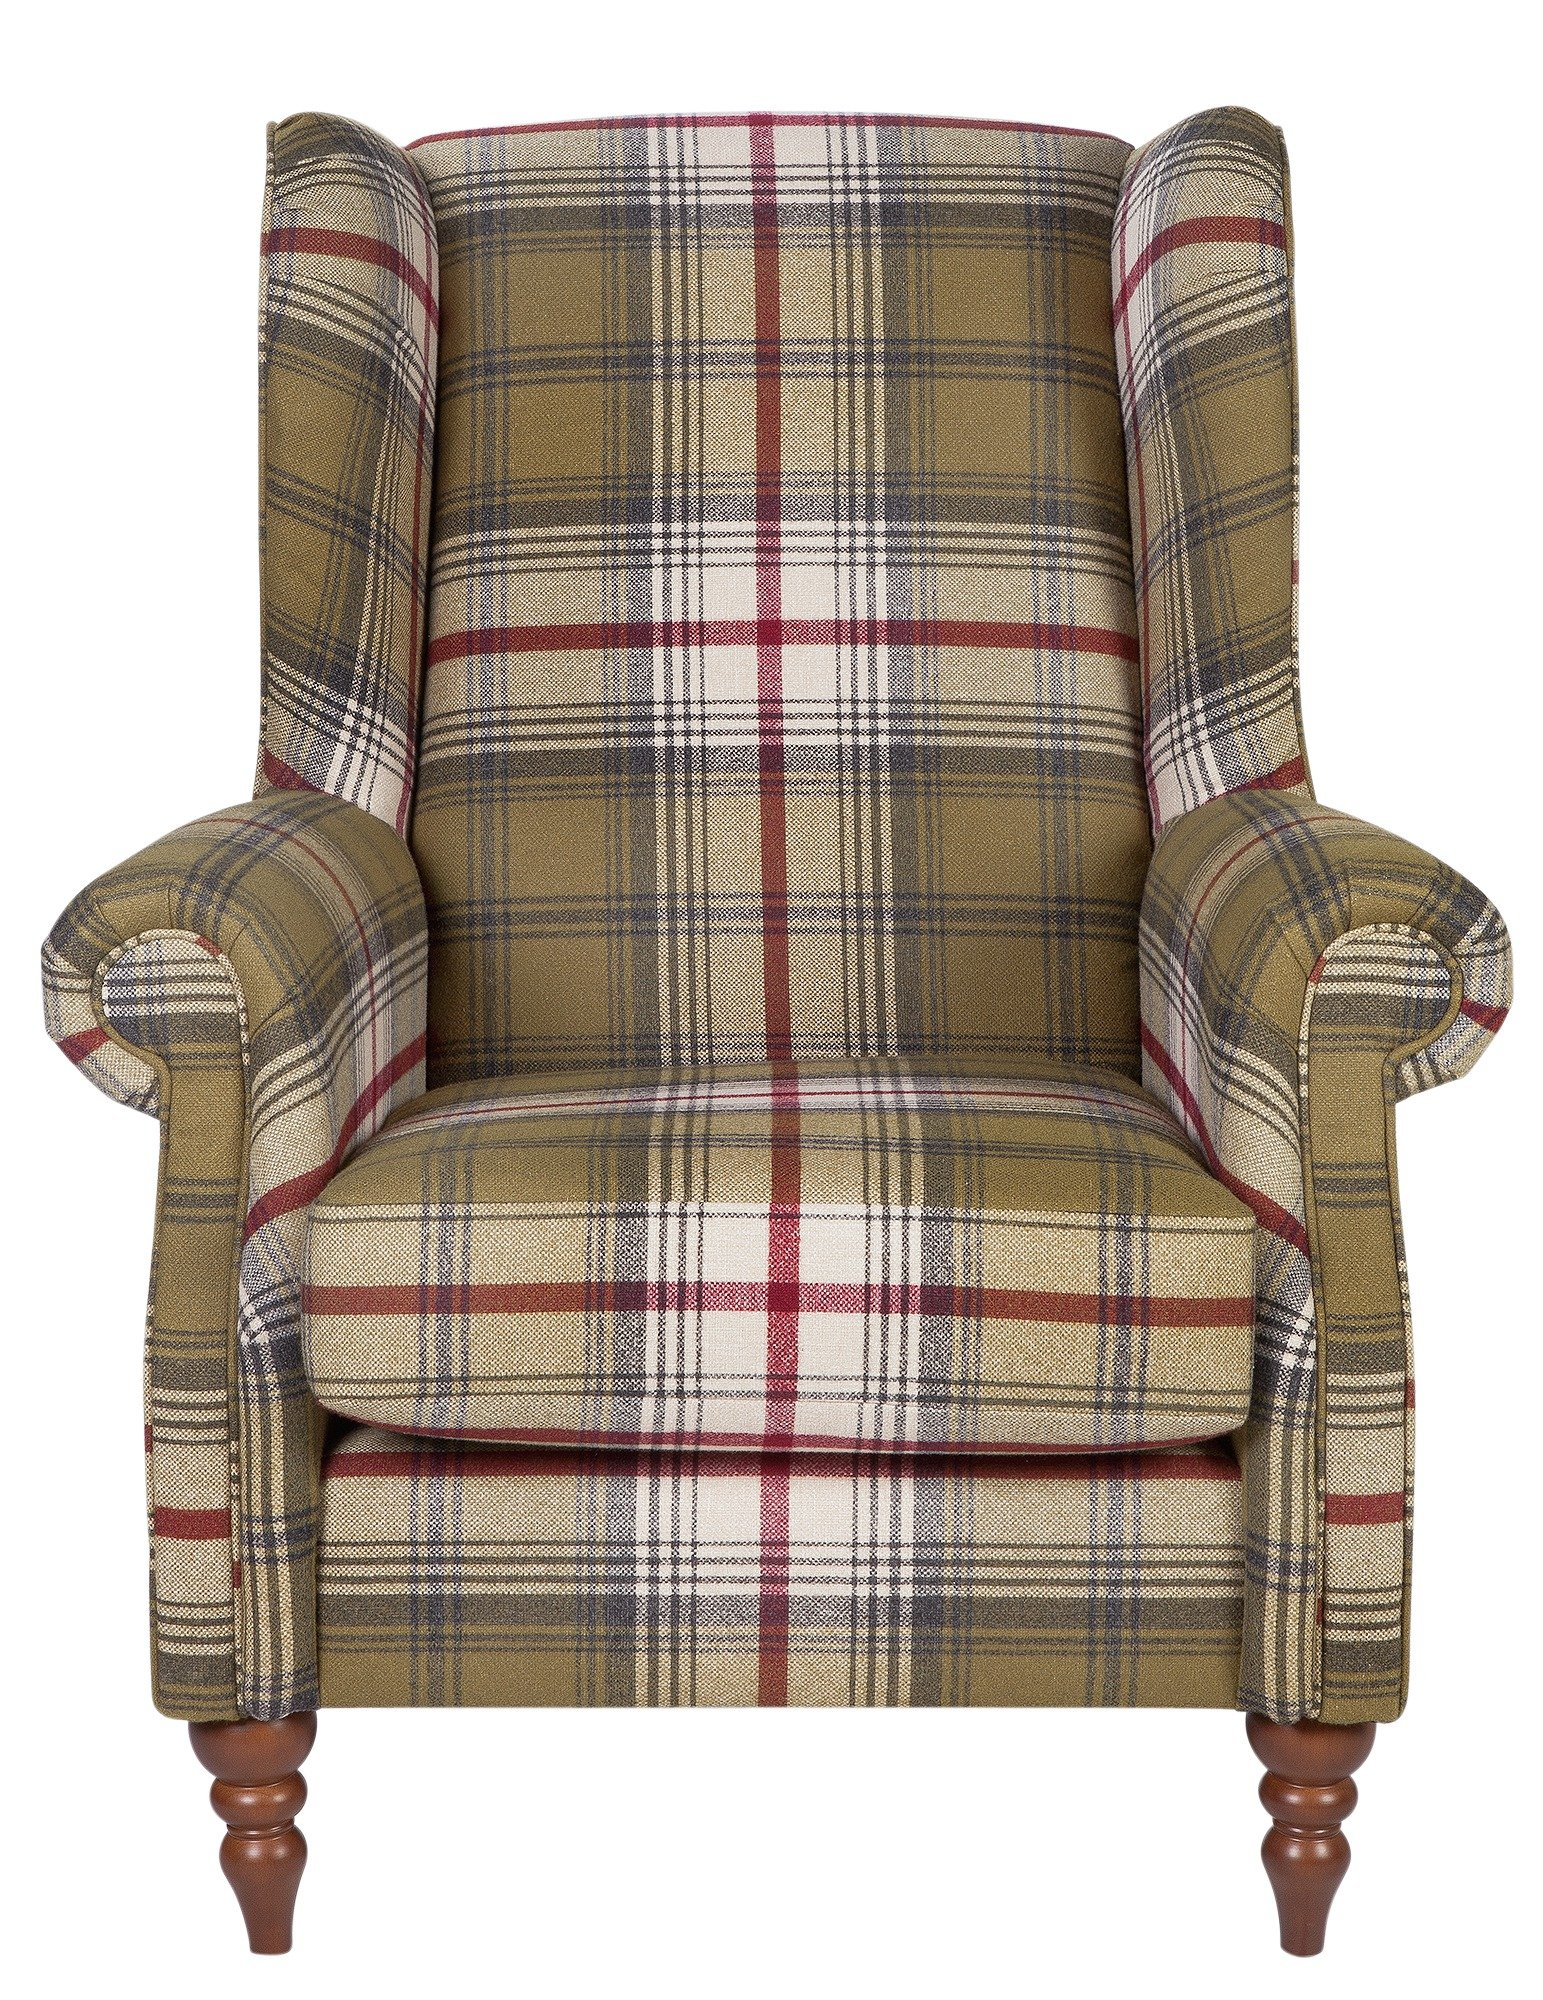 Argos Home Argyll Fabric High Back Chair - Autumn Tartan